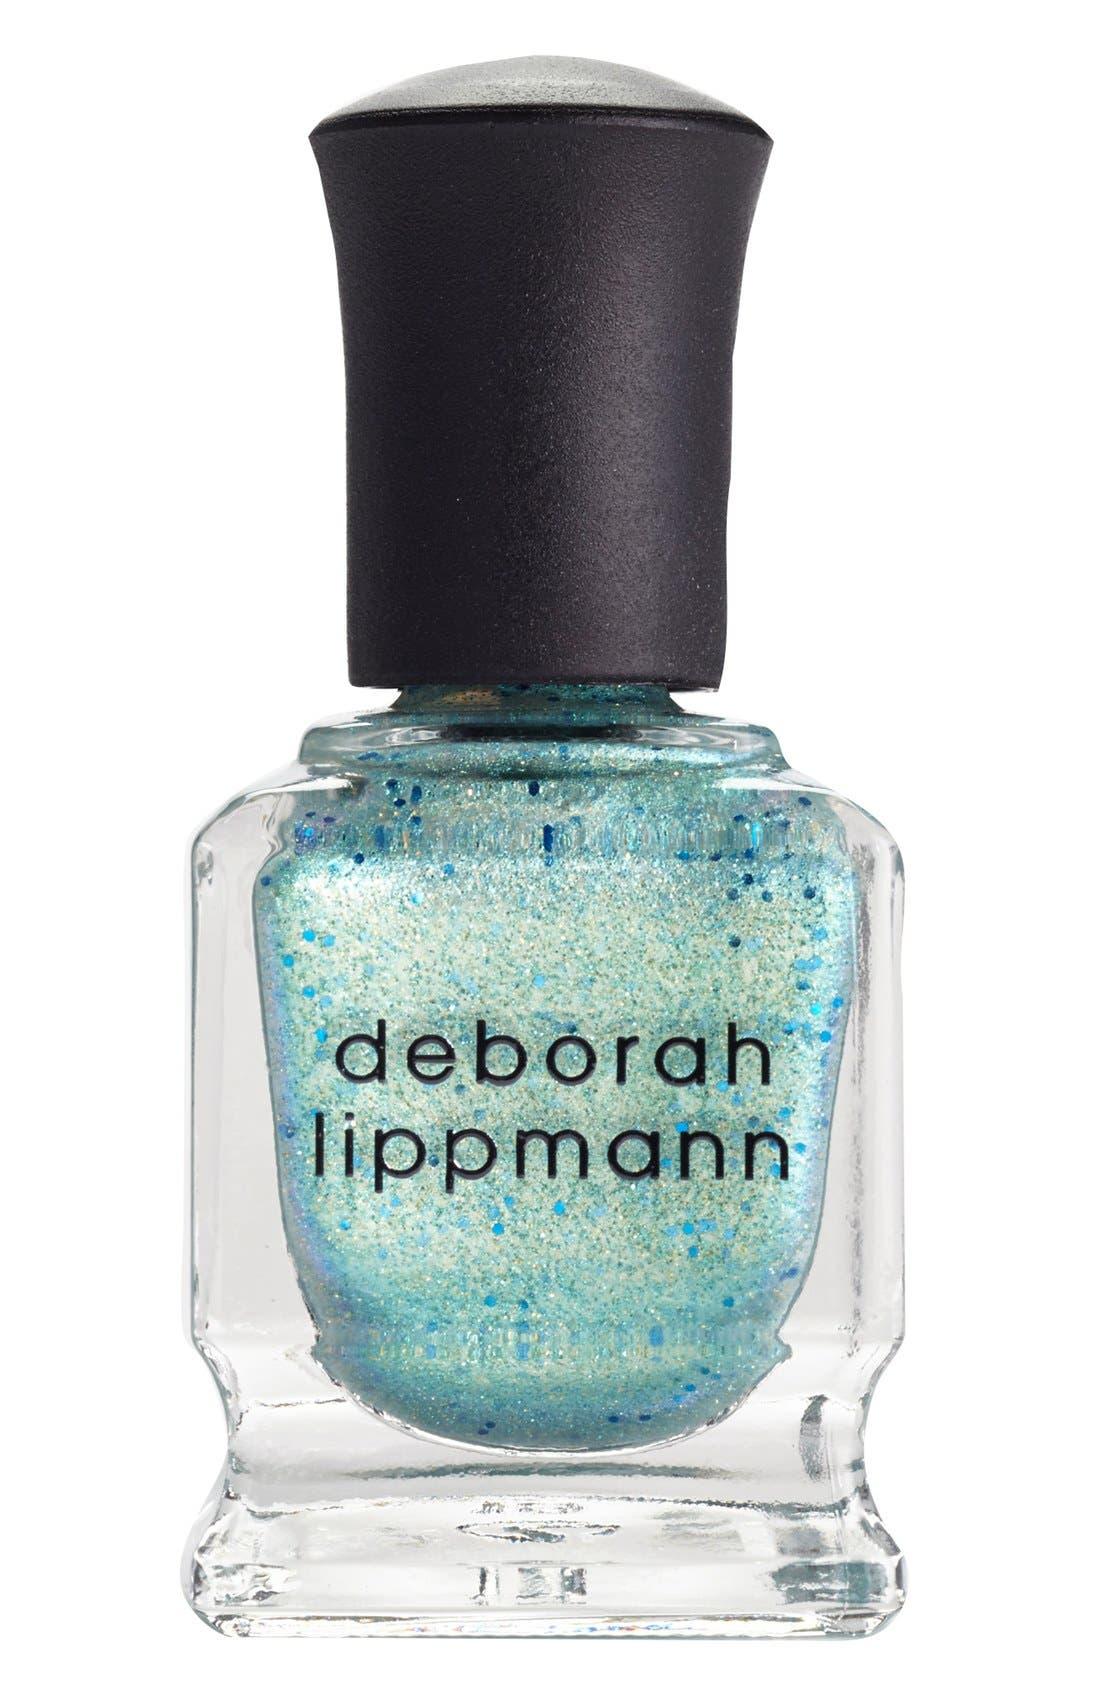 Deborah Lippmann Glitter Nail Color